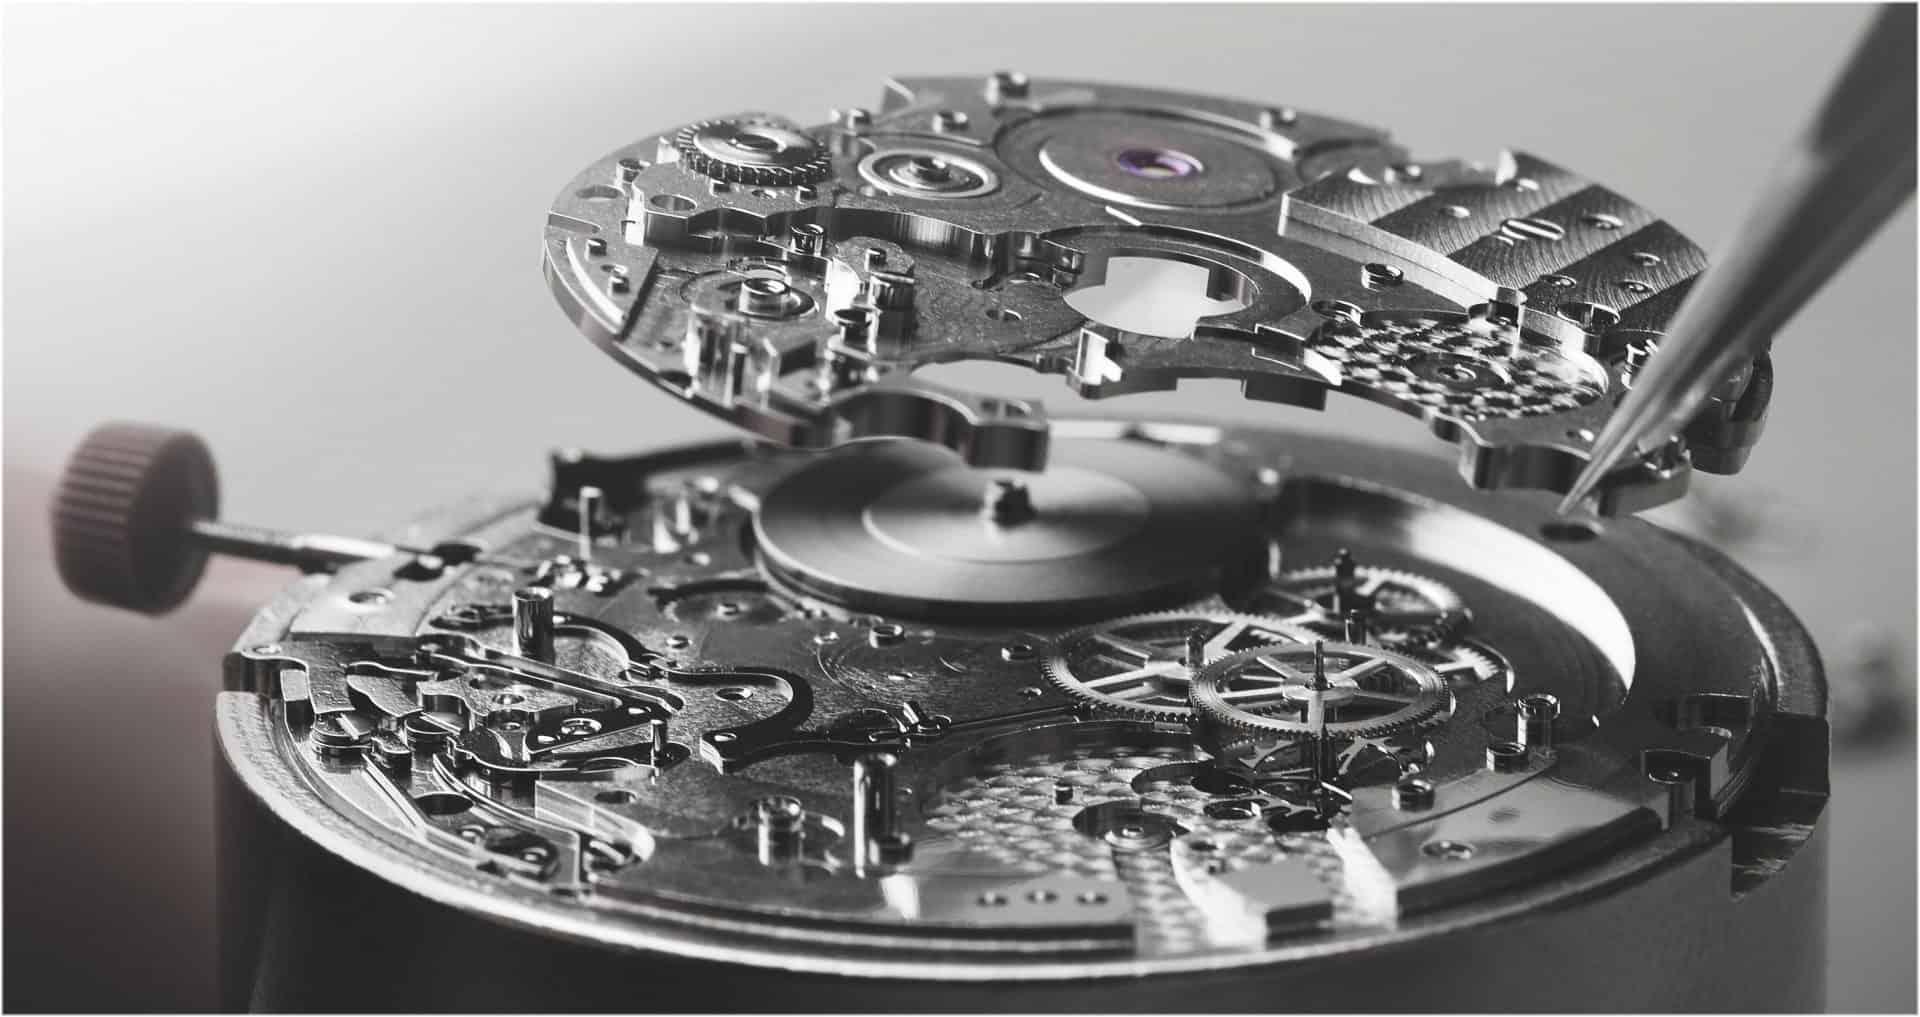 Da Kaliber BVL 318 im Bulgari Octo Finissimo Chronograph GMT ist nur 3,3 mm hoch